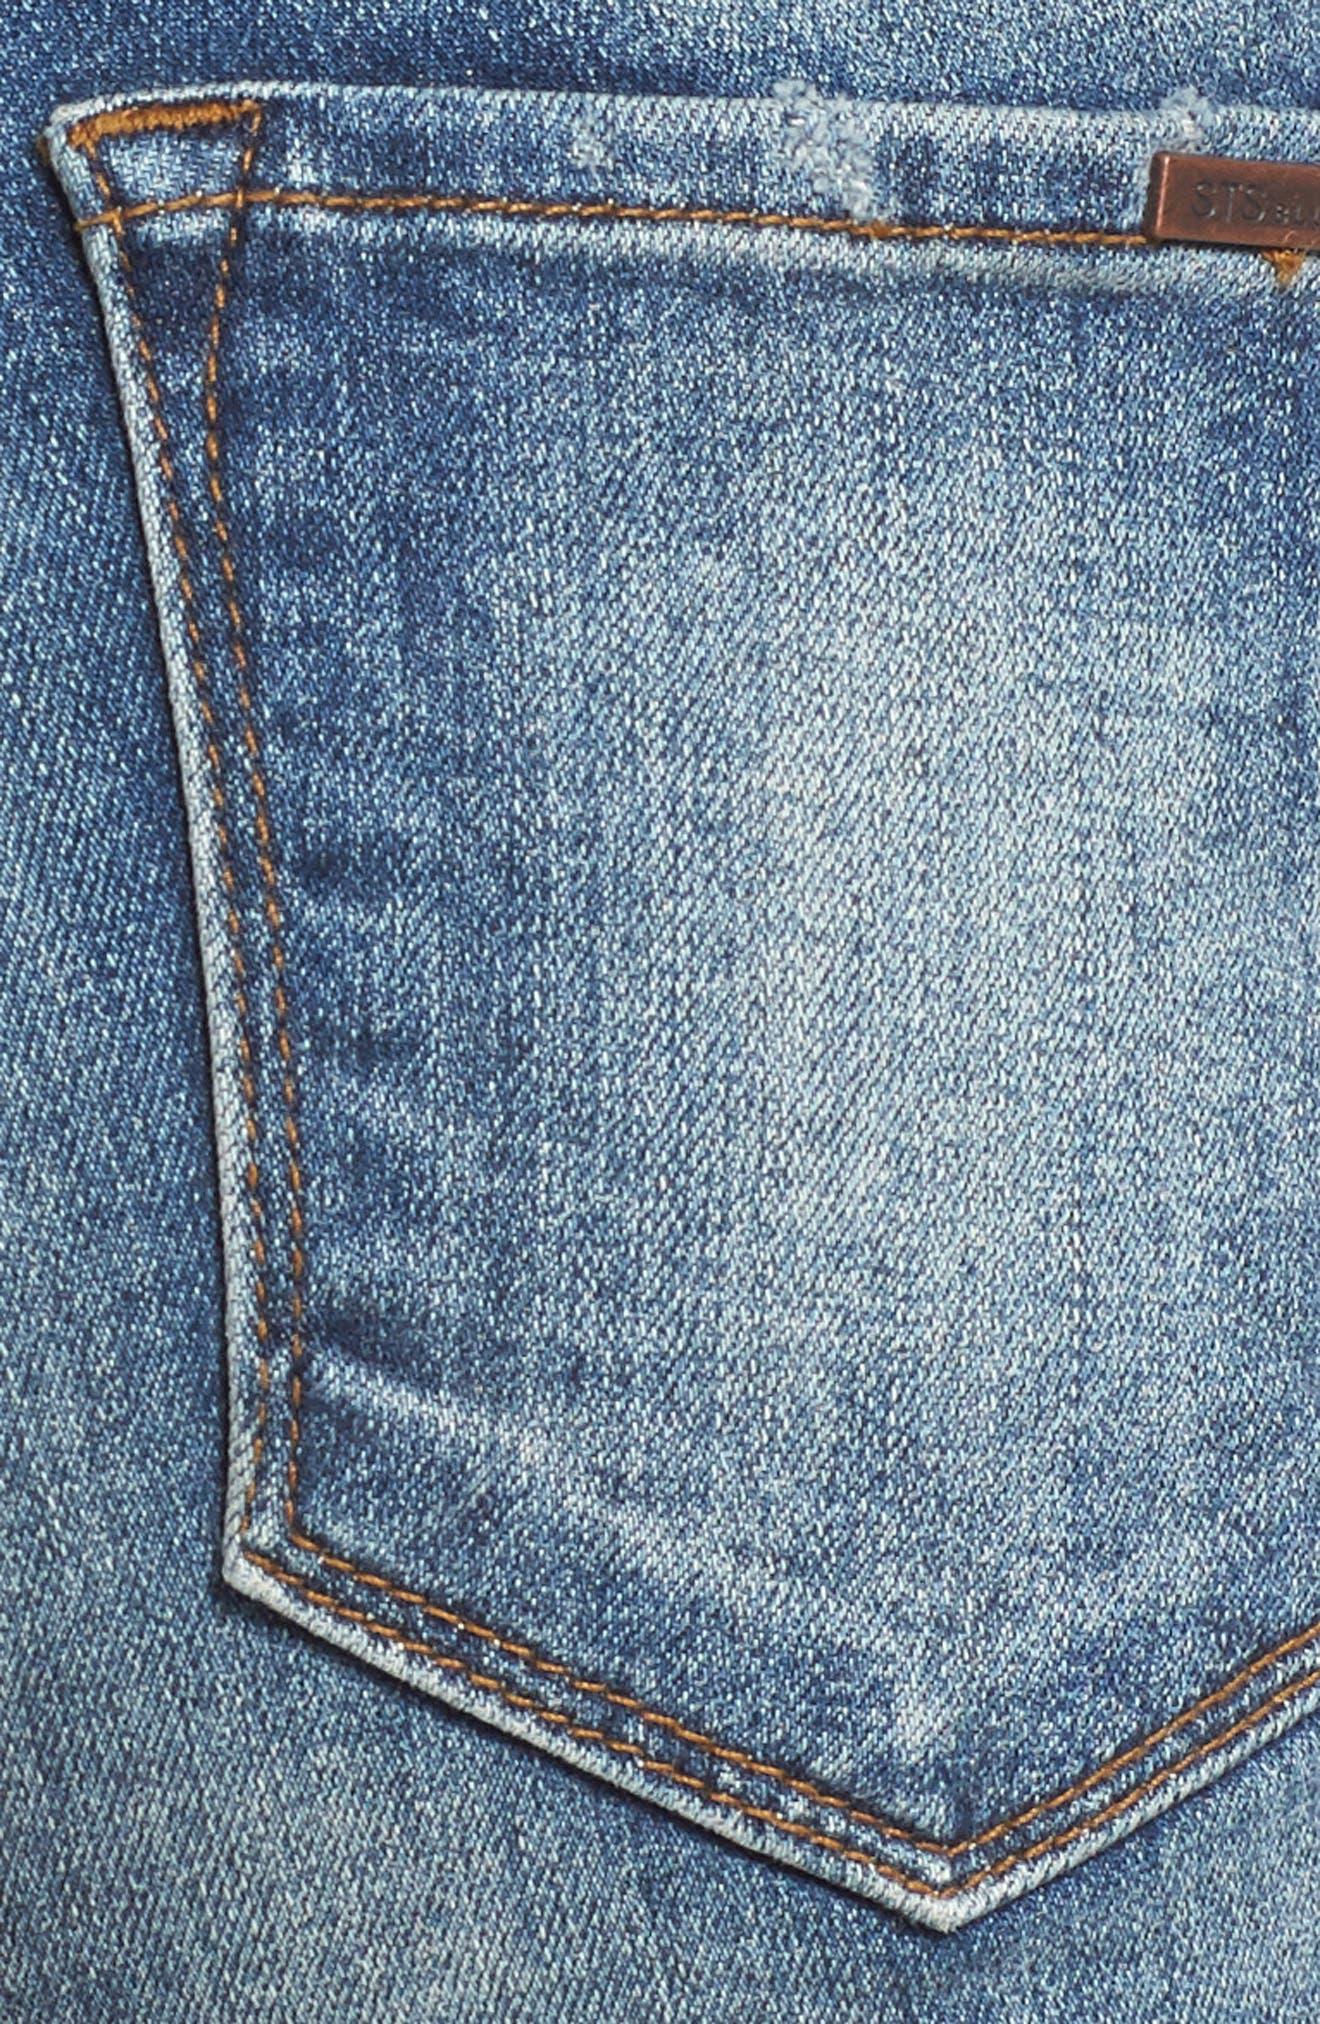 Boyfriend Denim Shorts,                             Alternate thumbnail 6, color,                             Menlo